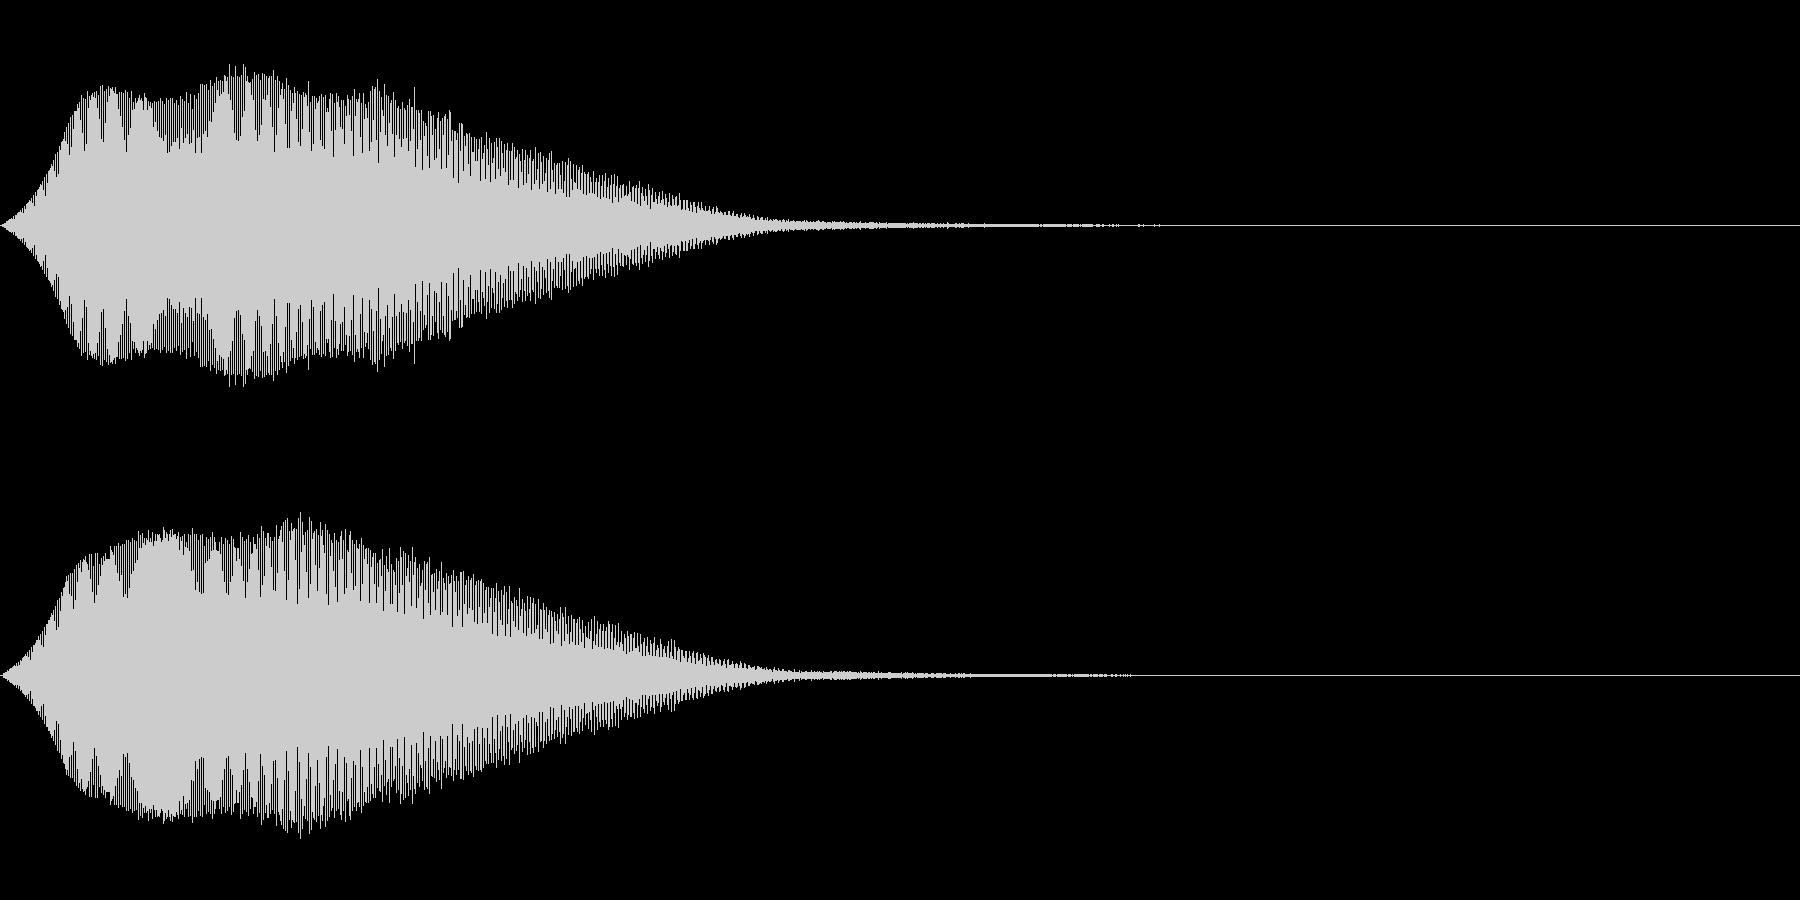 TVFX テレビ向けヒューン音 1の未再生の波形